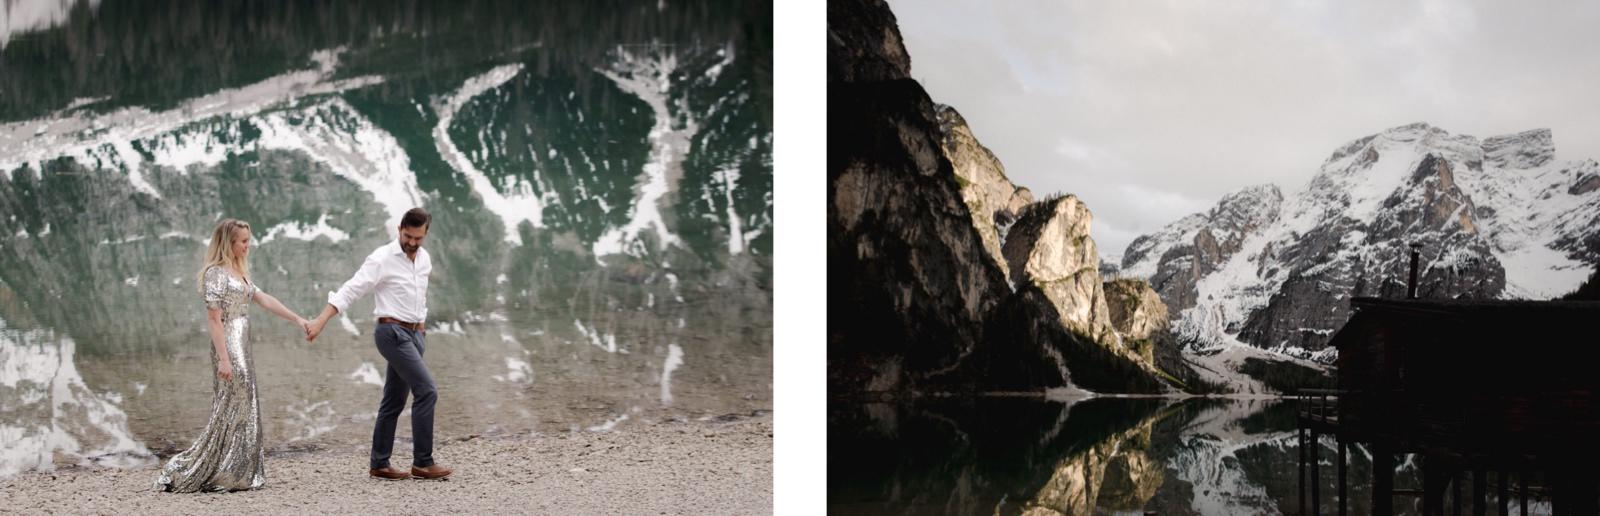 Fotomagoria Dolomites Lago di Braies Photographer 31.jpg